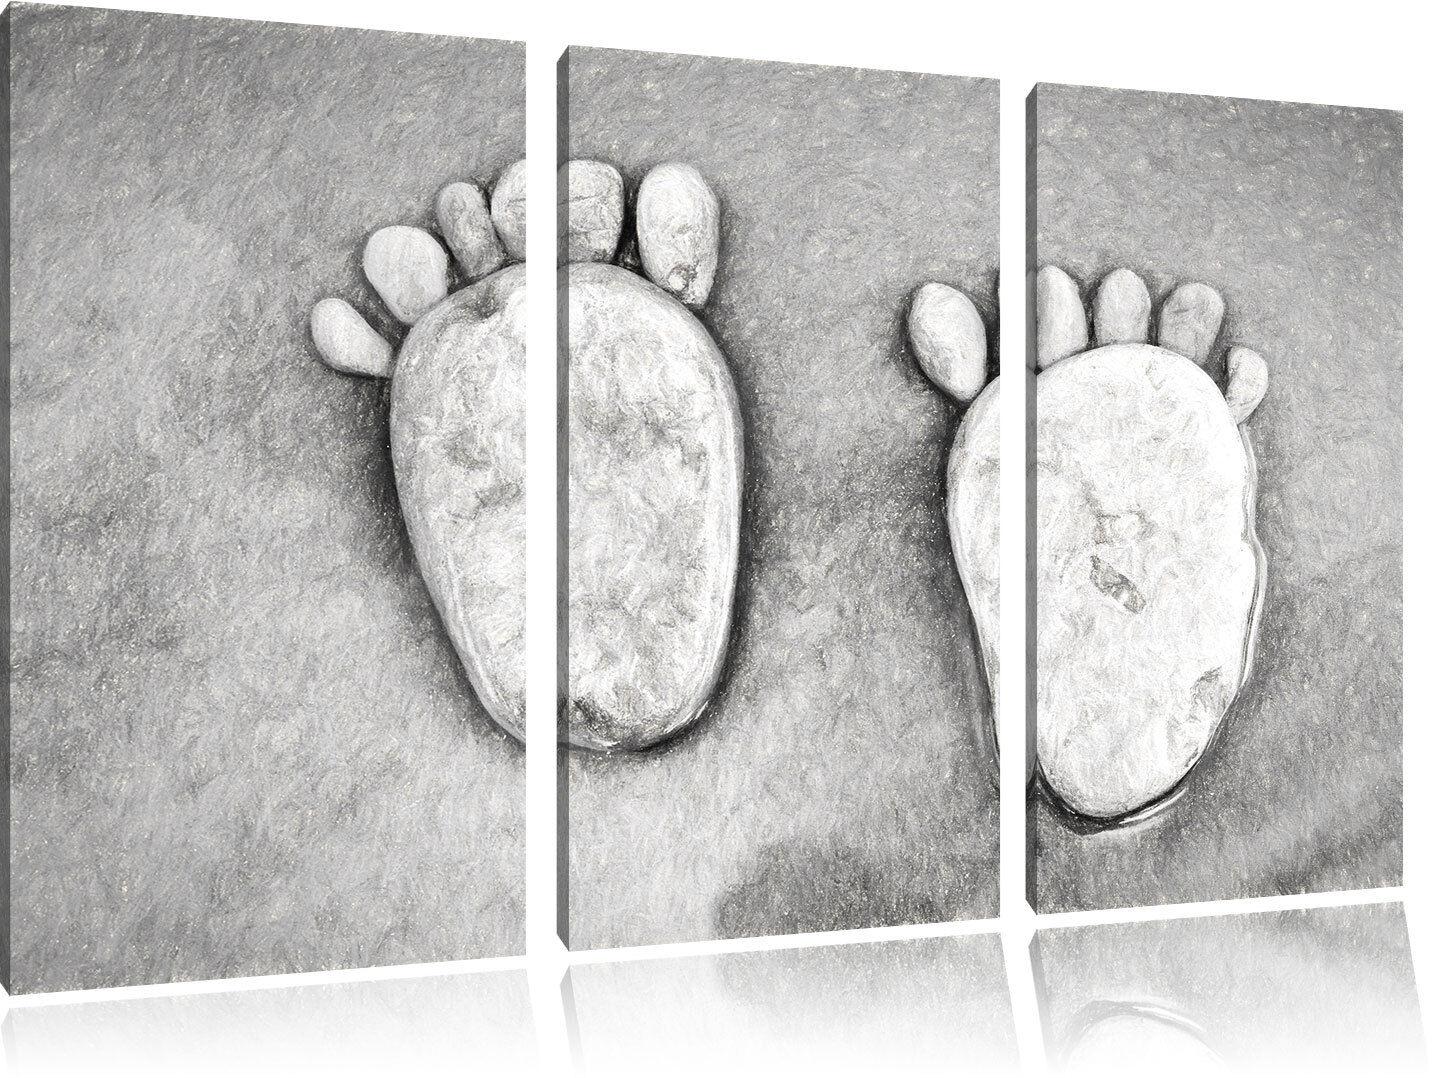 Impronte piedi con pietre gelegt 3 teiler su quadro su 3 teiler tel